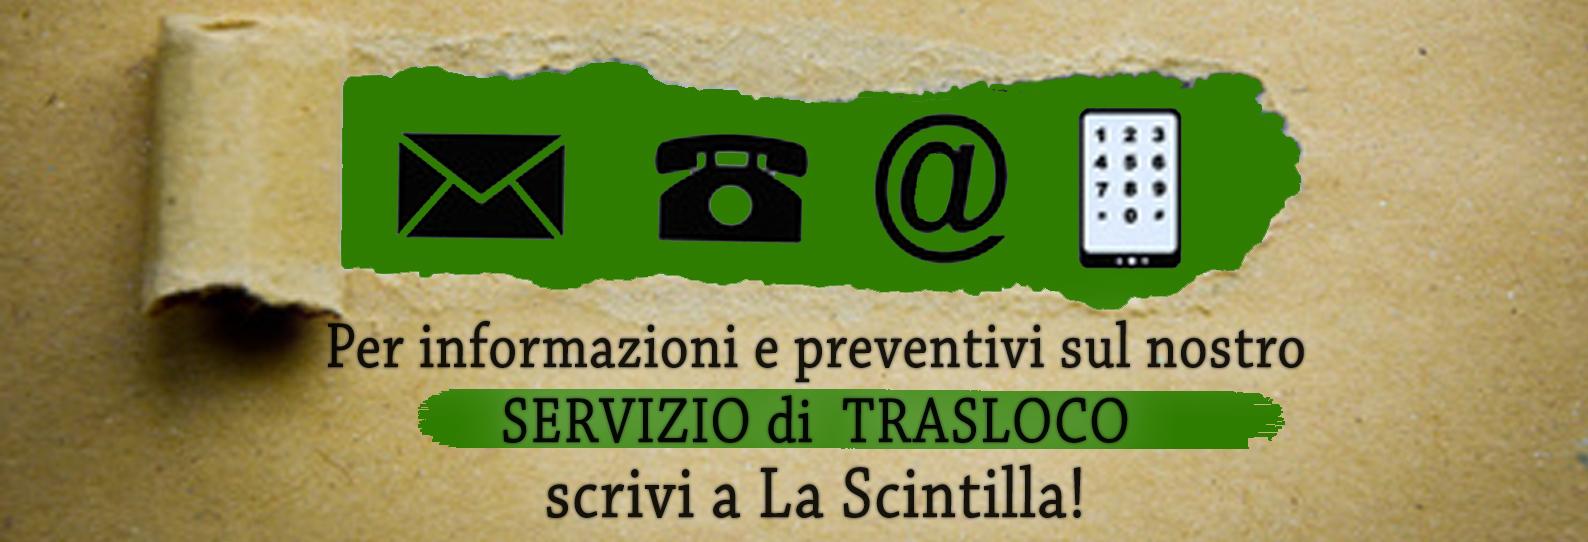 Scintilla_sito pll_banner_trasloco_